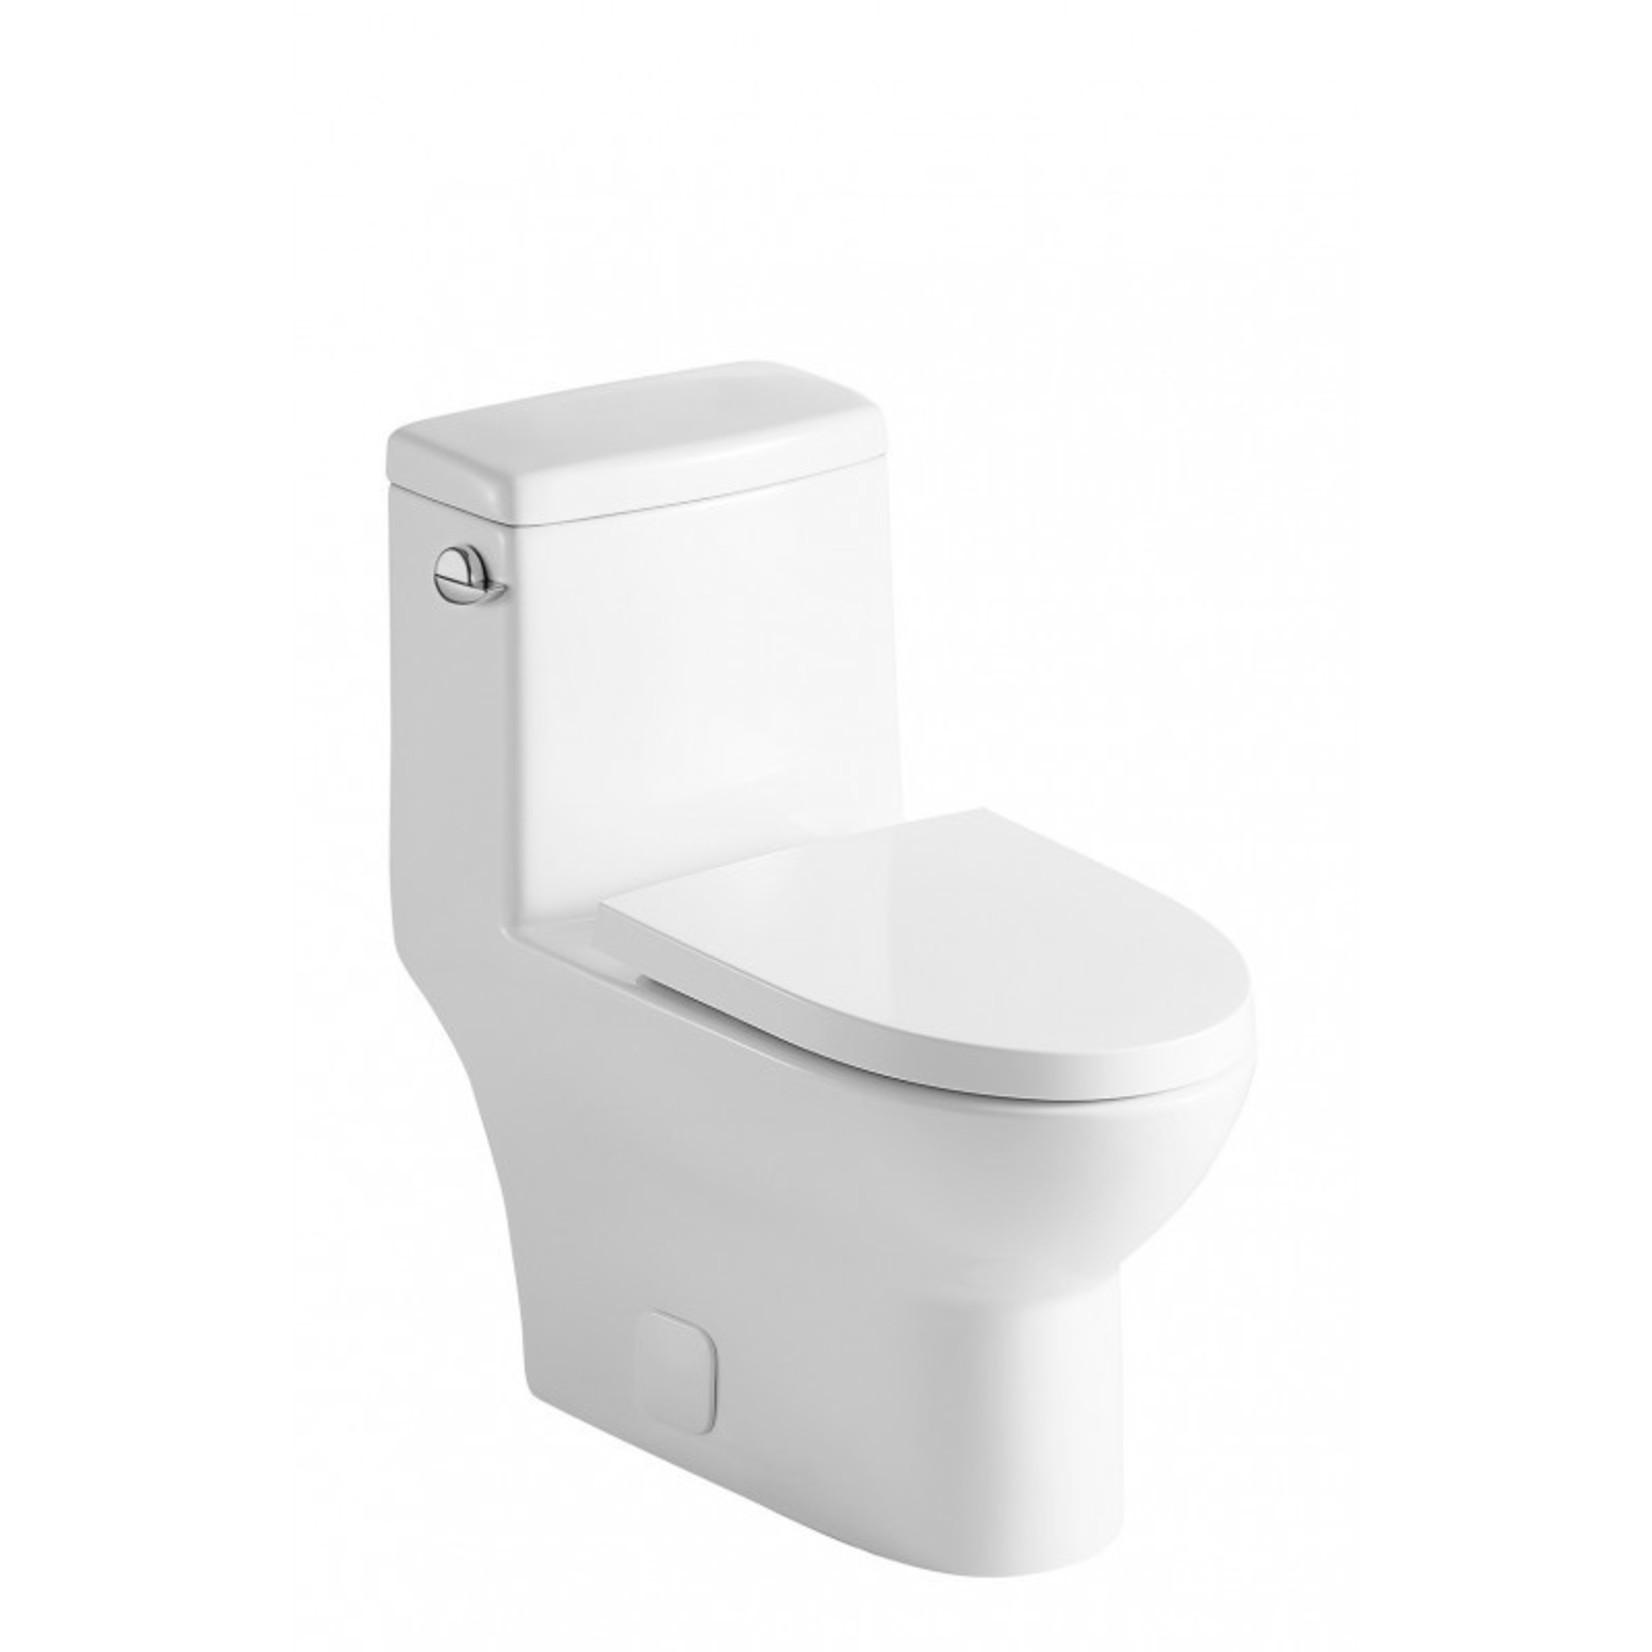 Toilette monopièce DI-153 side flush